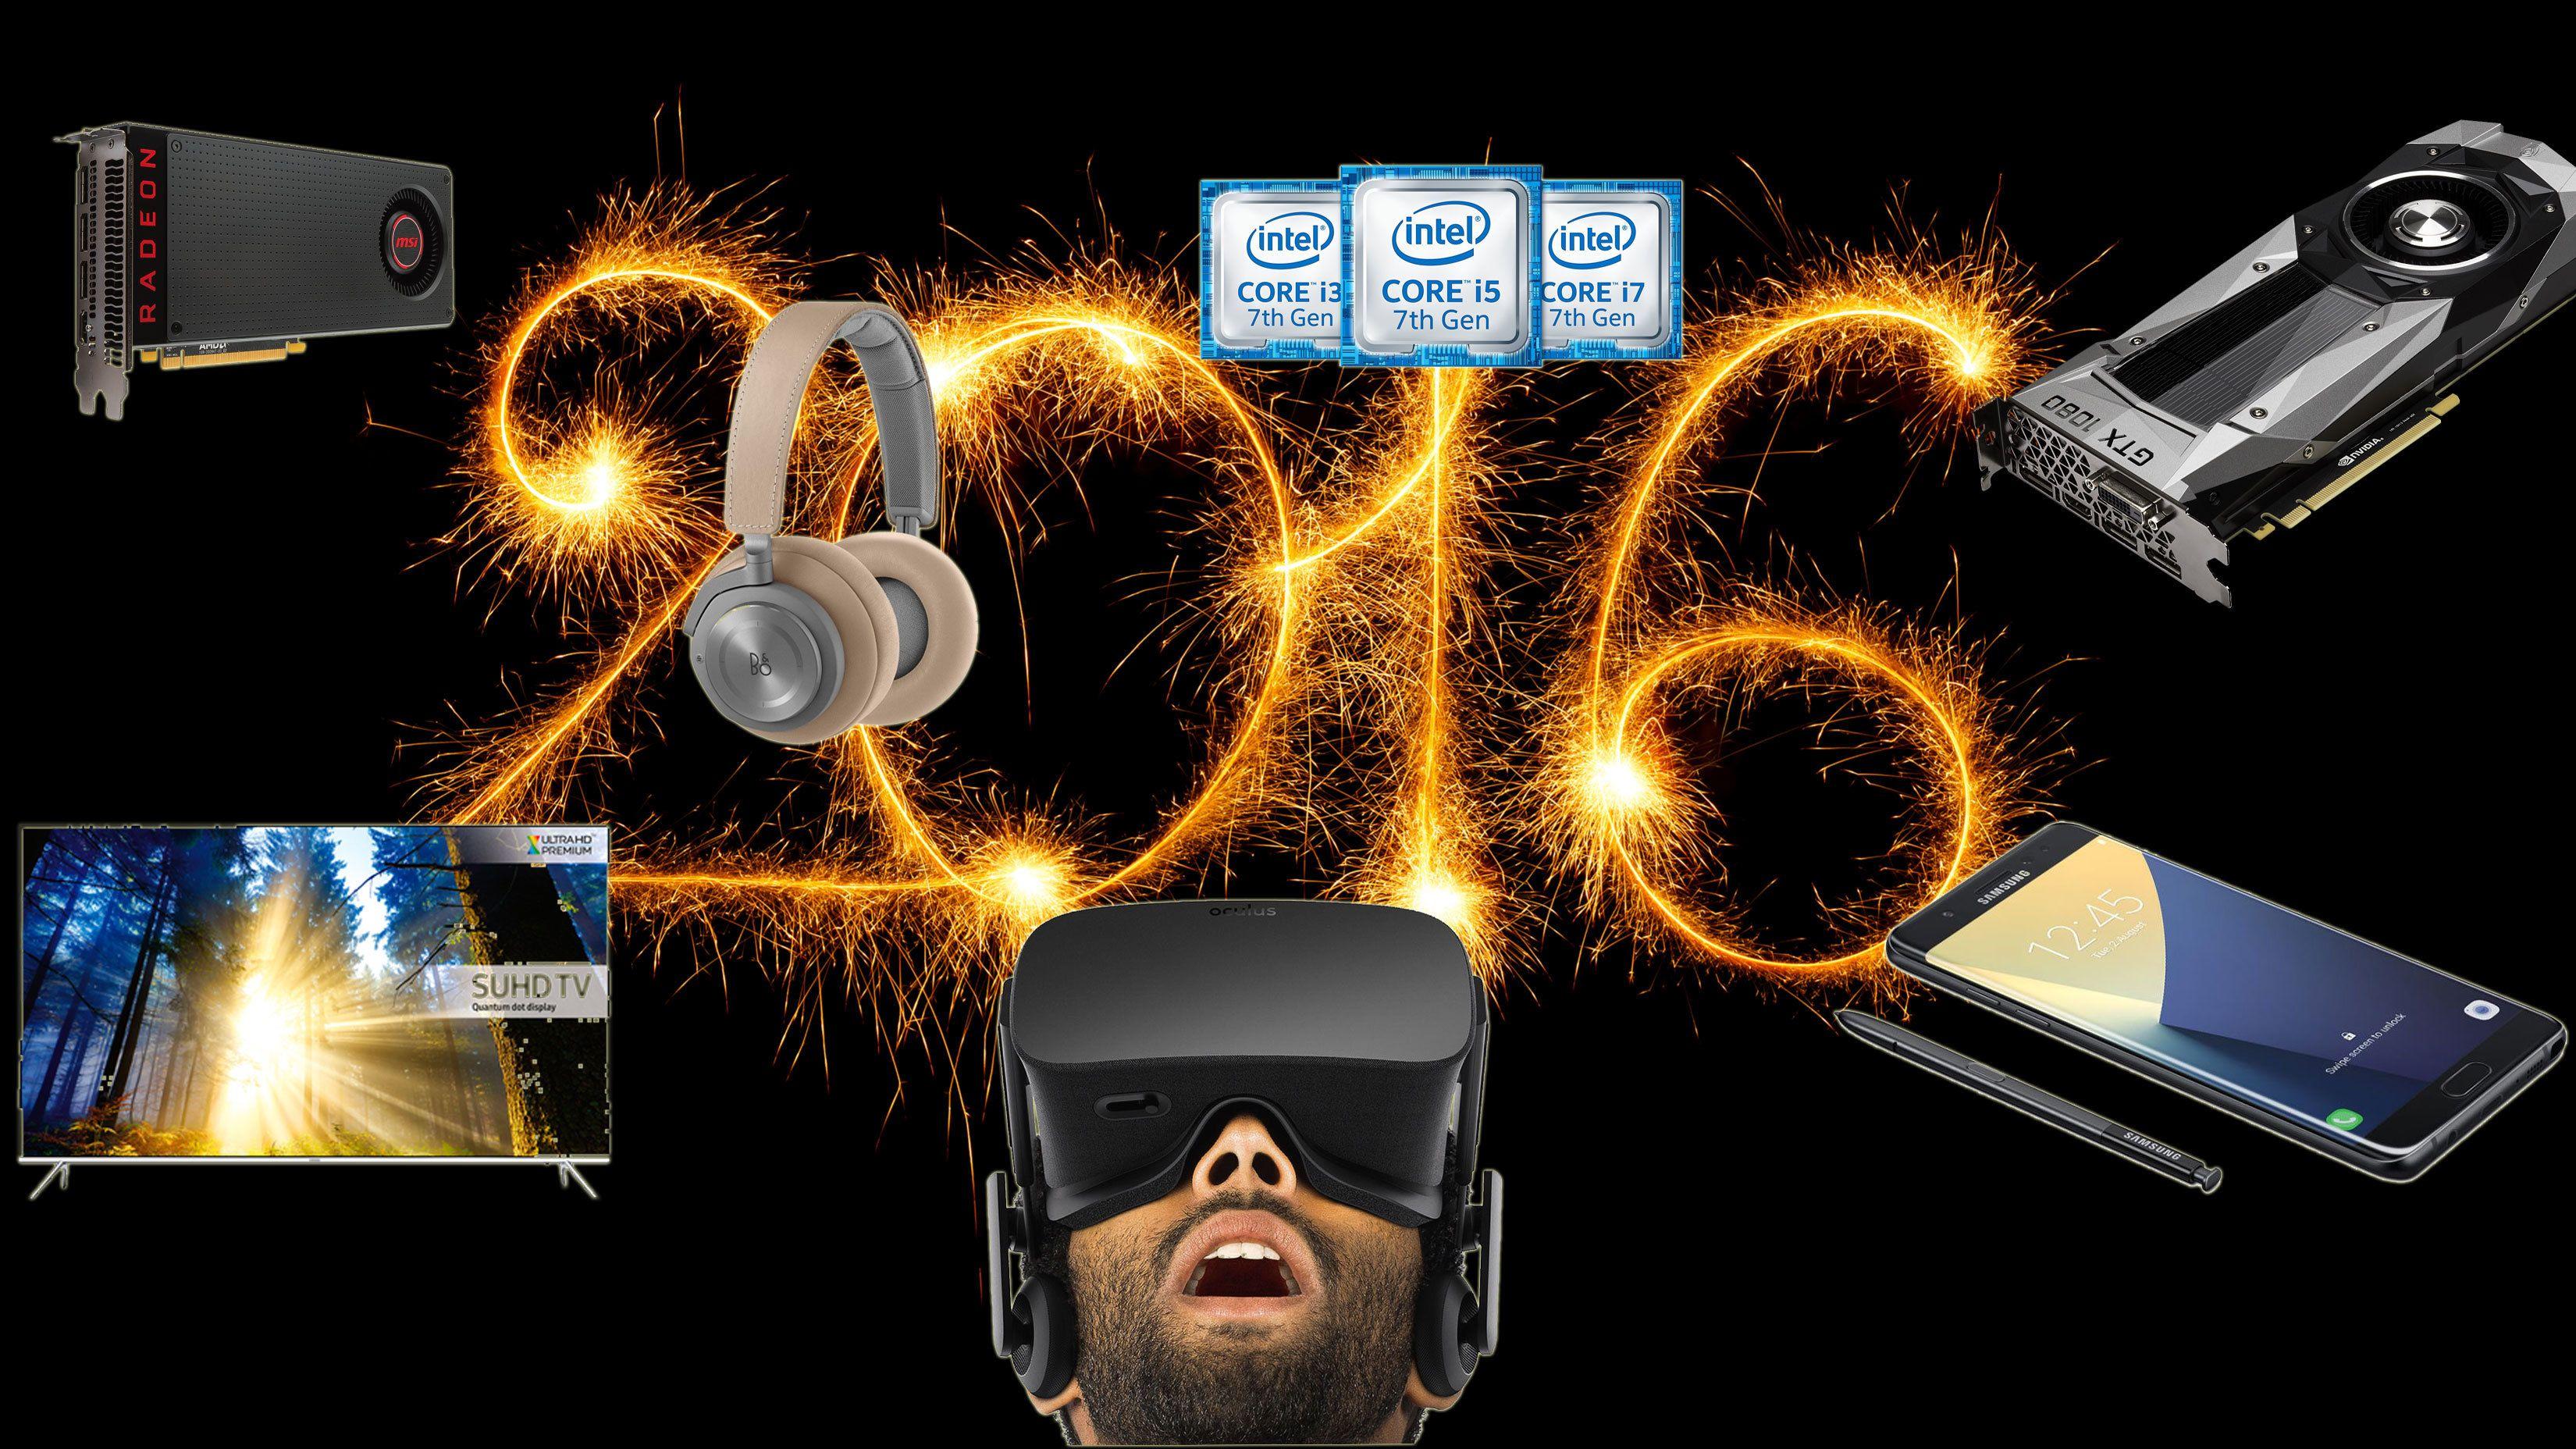 Teknologiåret 2016 - del 1